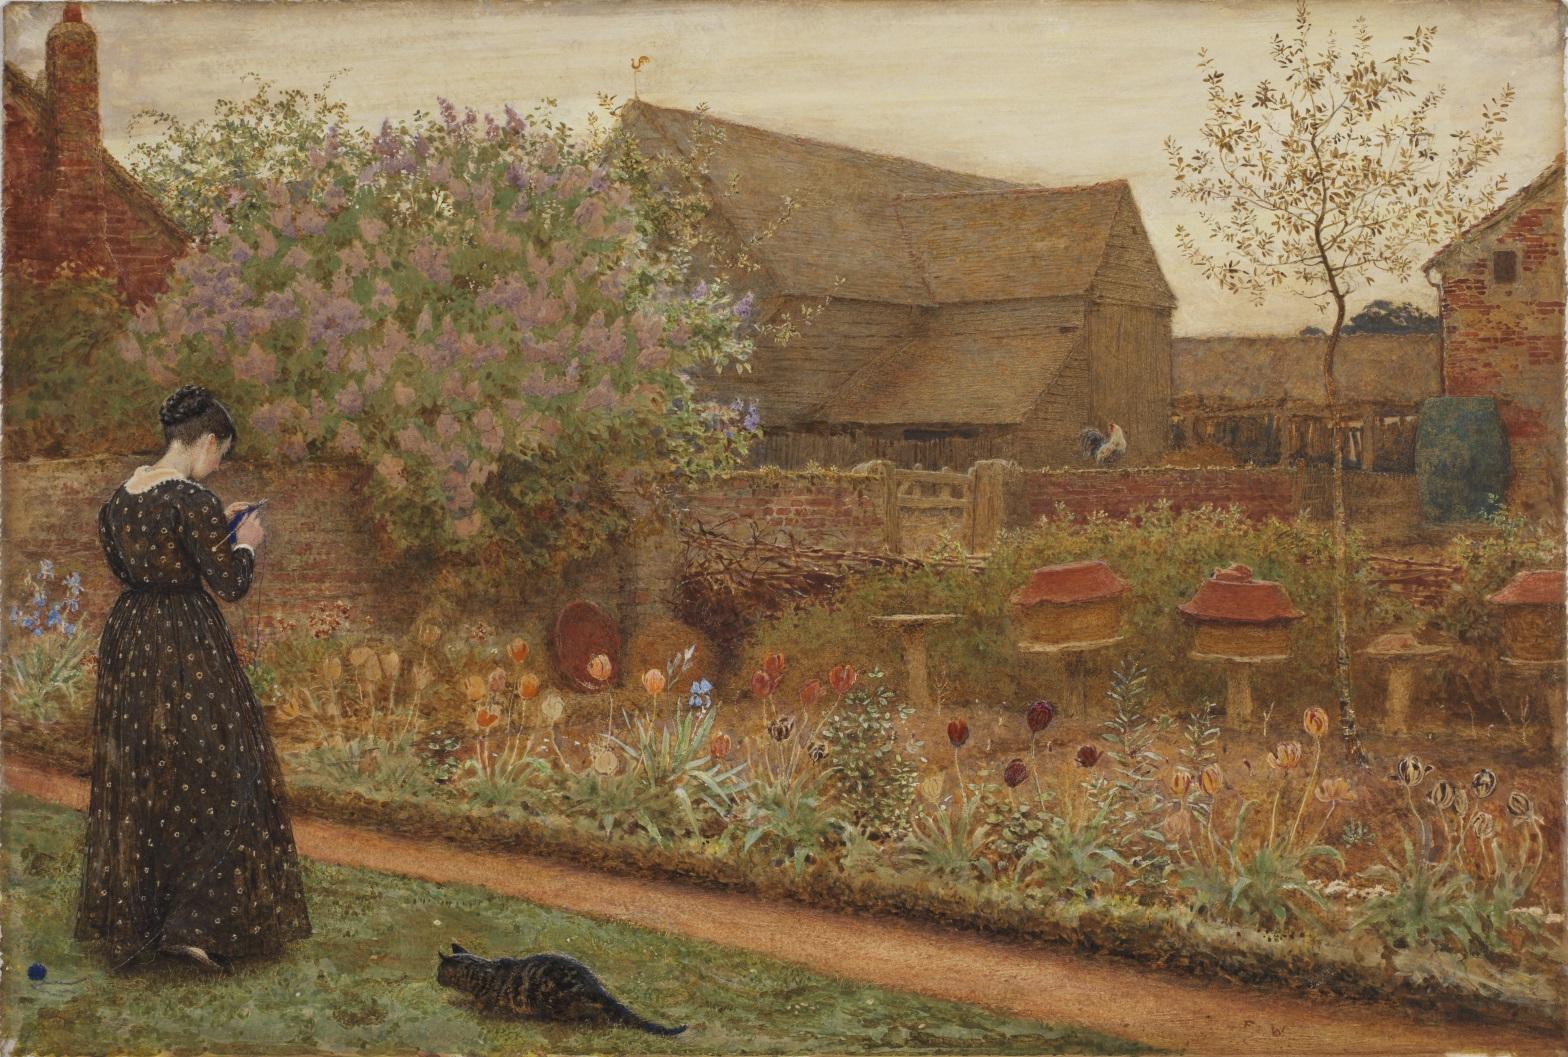 File:Frederick Walker, The Old Farm Garden, 1871.jpg - Wikimedia Commons